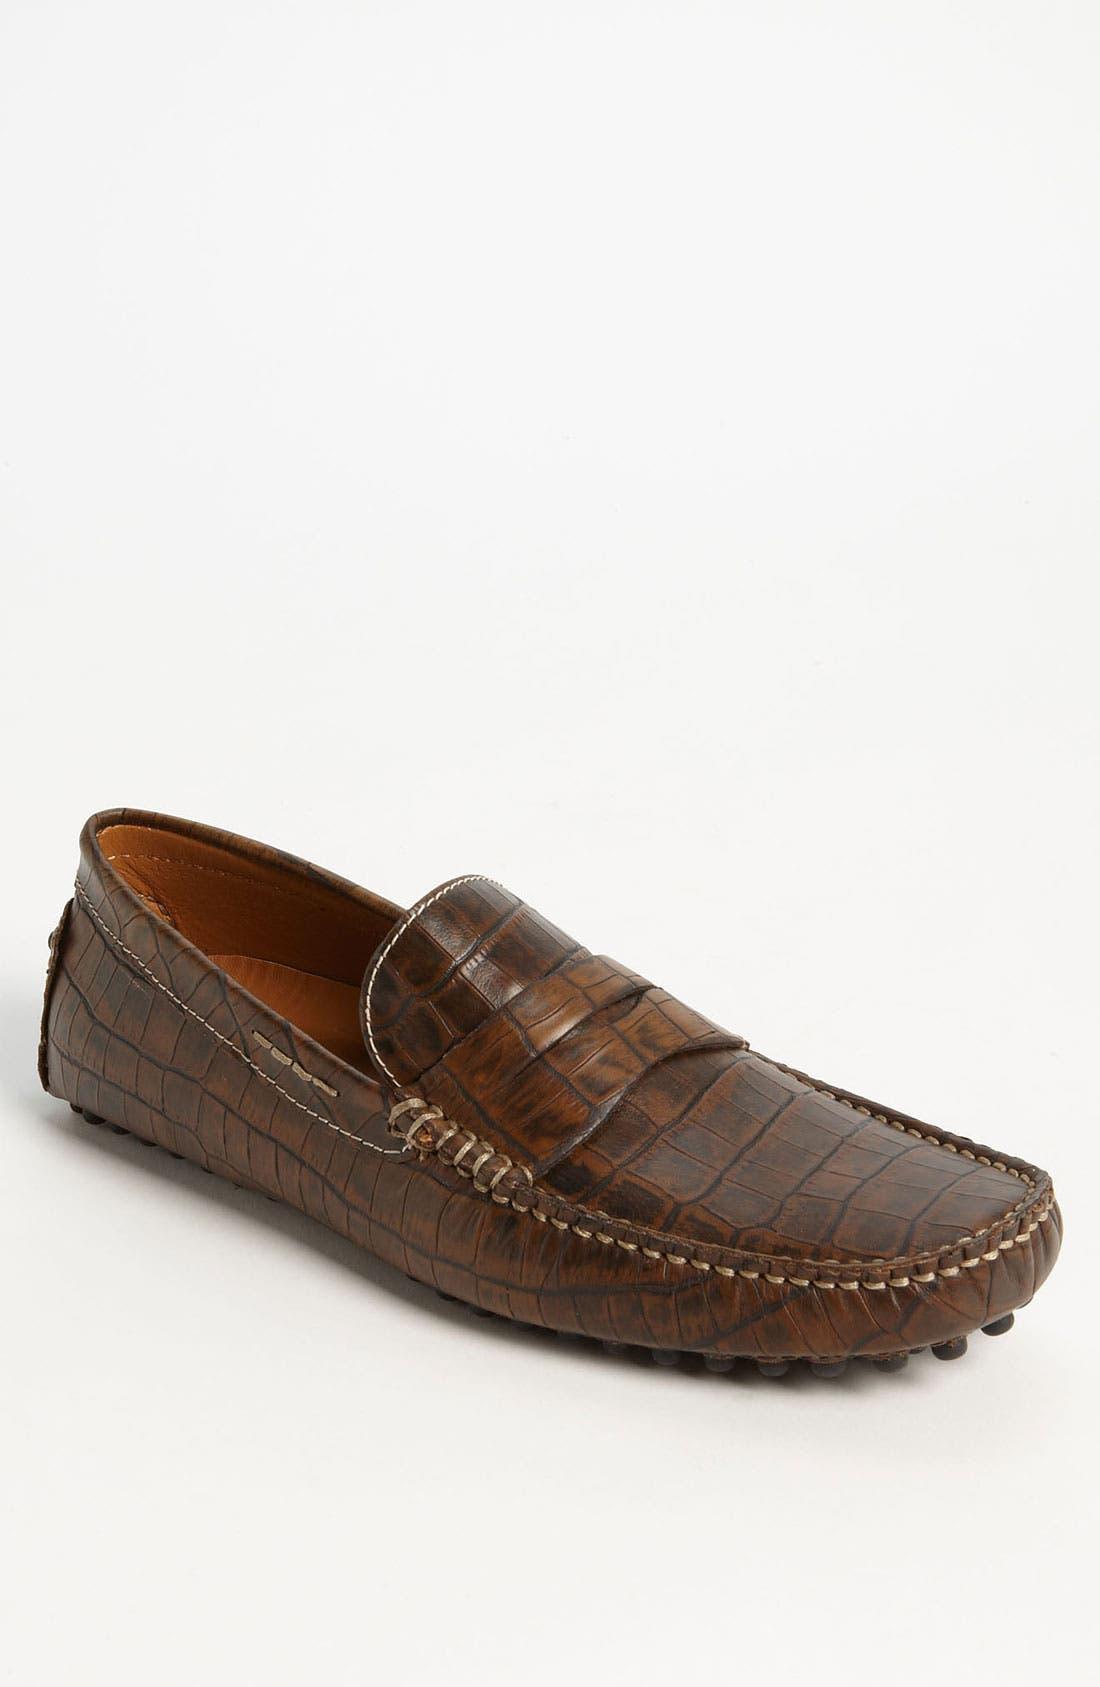 Alternate Image 1 Selected - G Brown 'Tortola' Driving Shoe